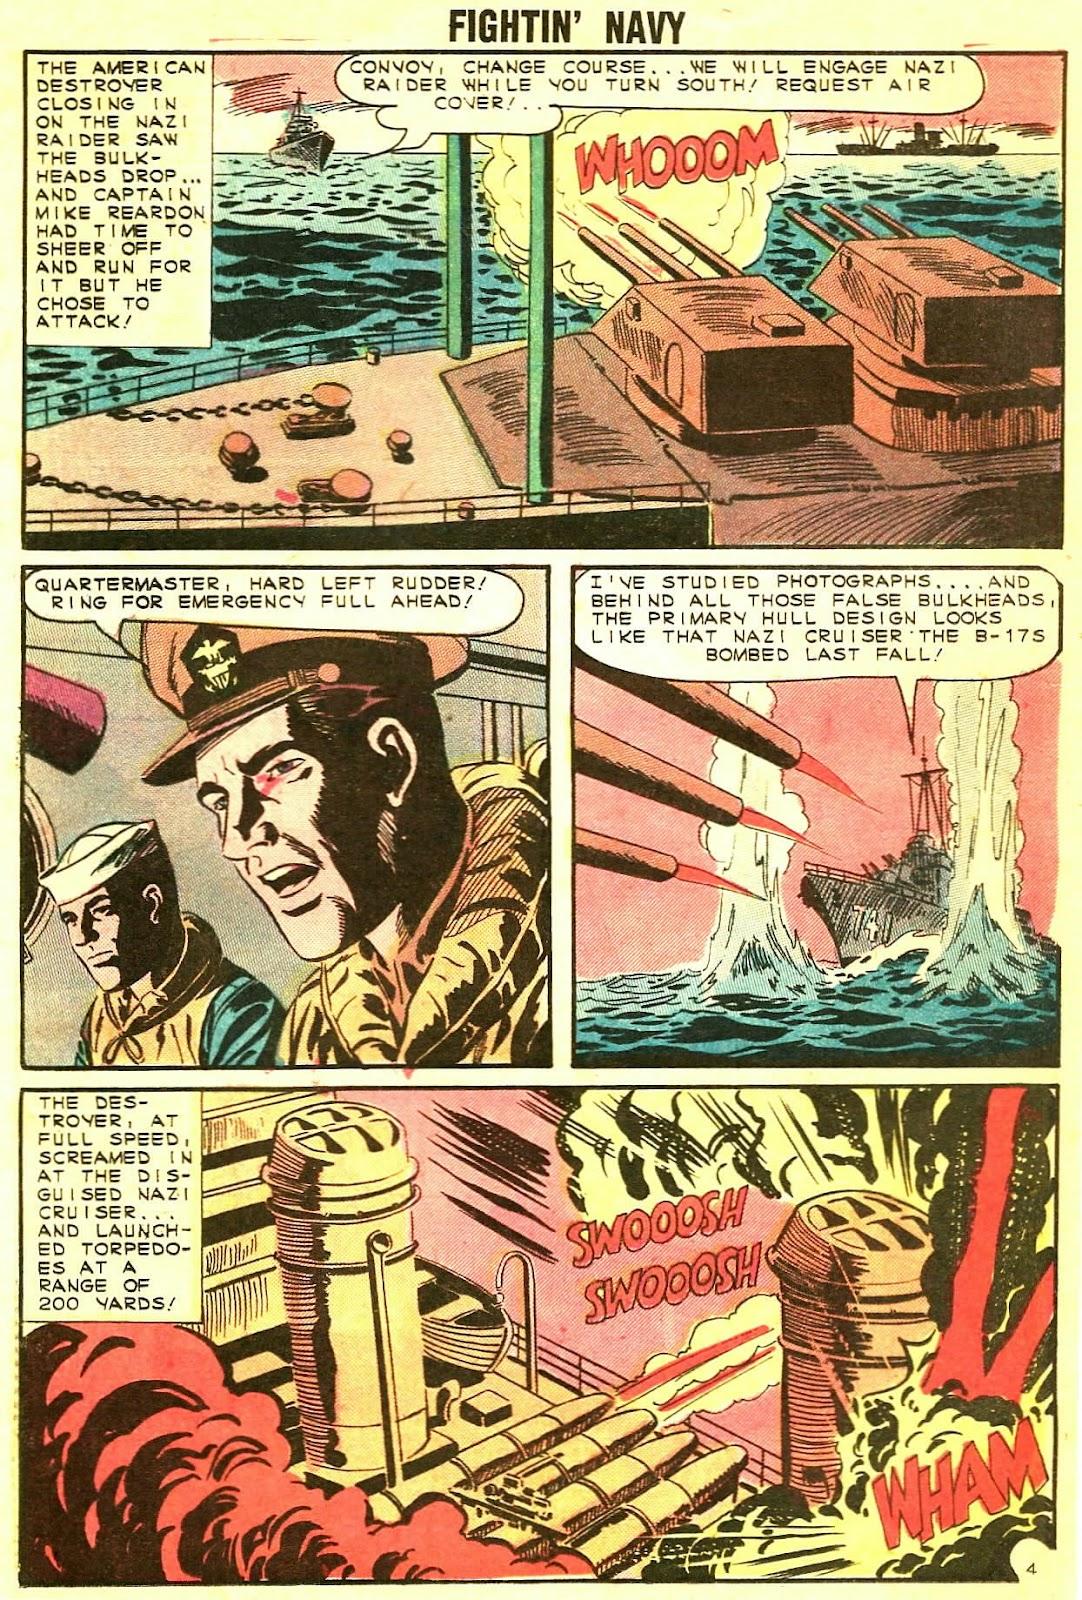 Read online Fightin' Navy comic -  Issue #115 - 24